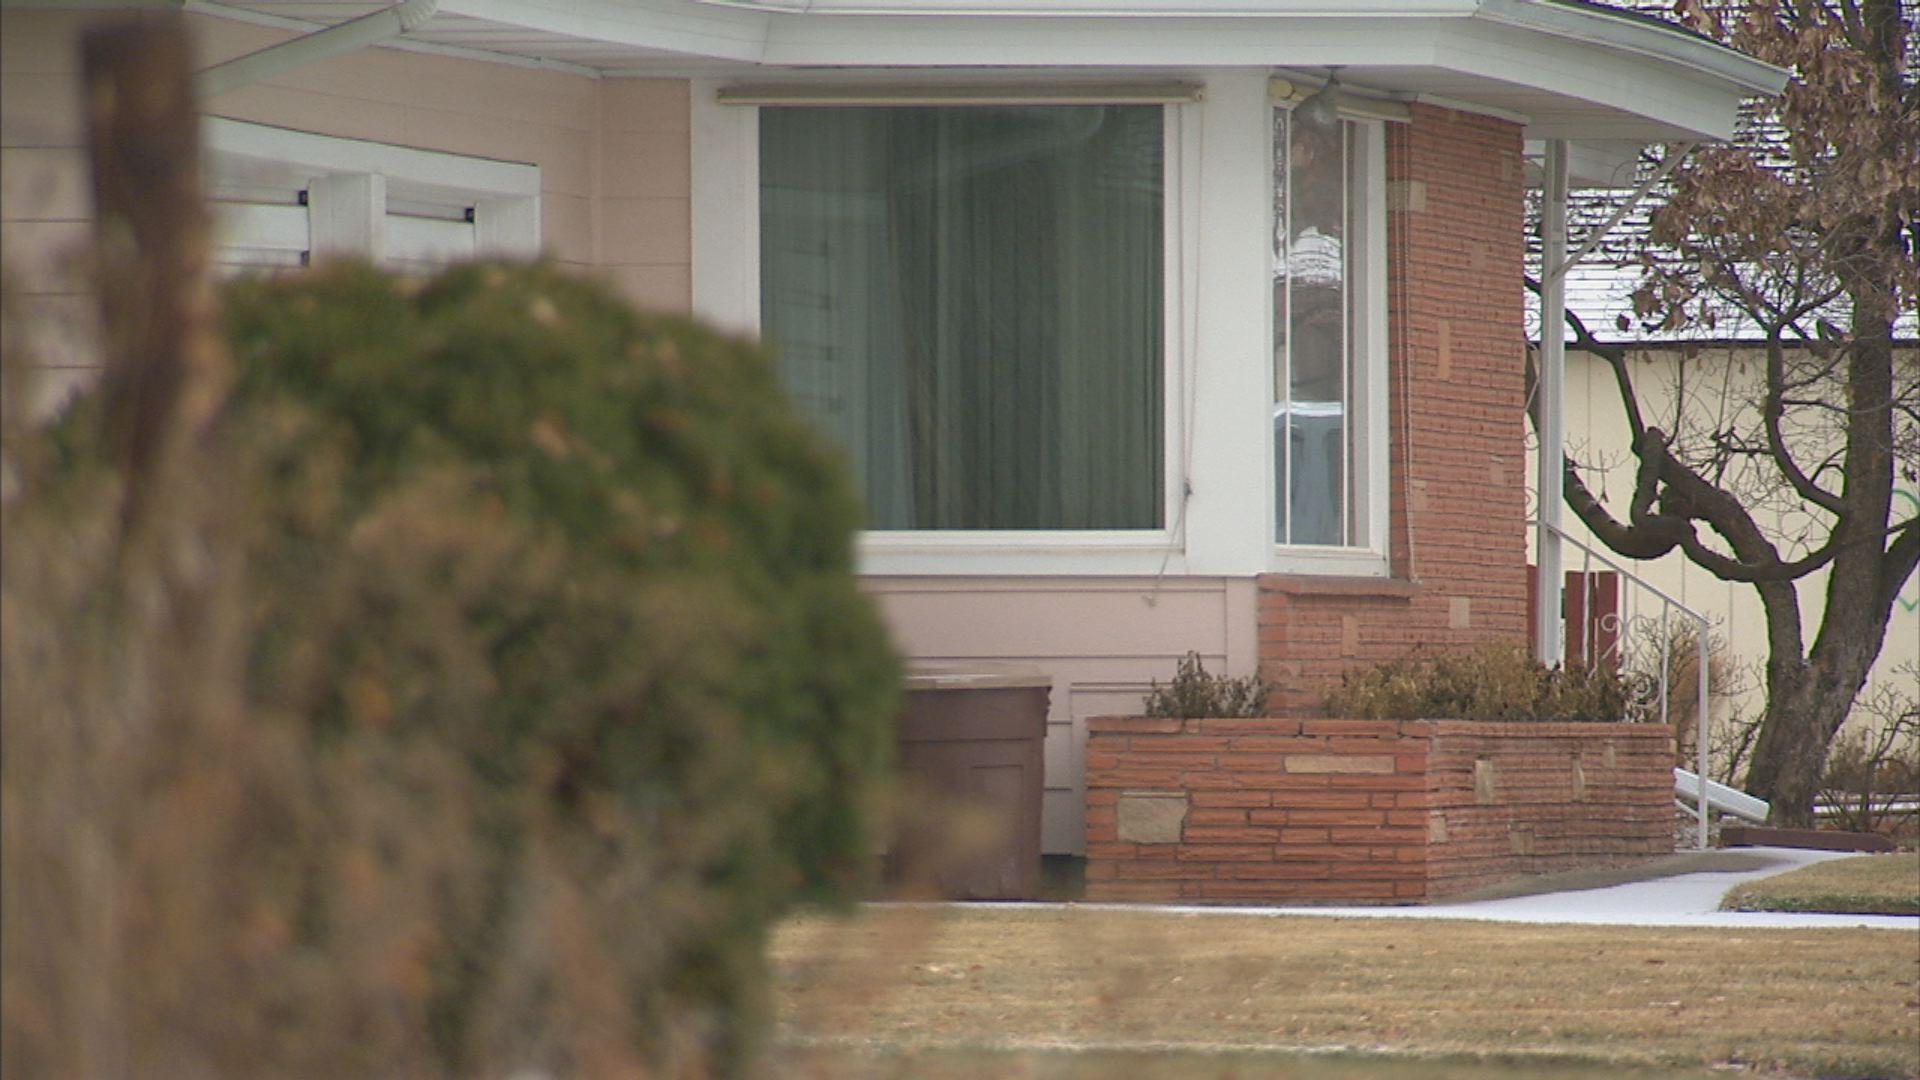 Preventing a home burglary